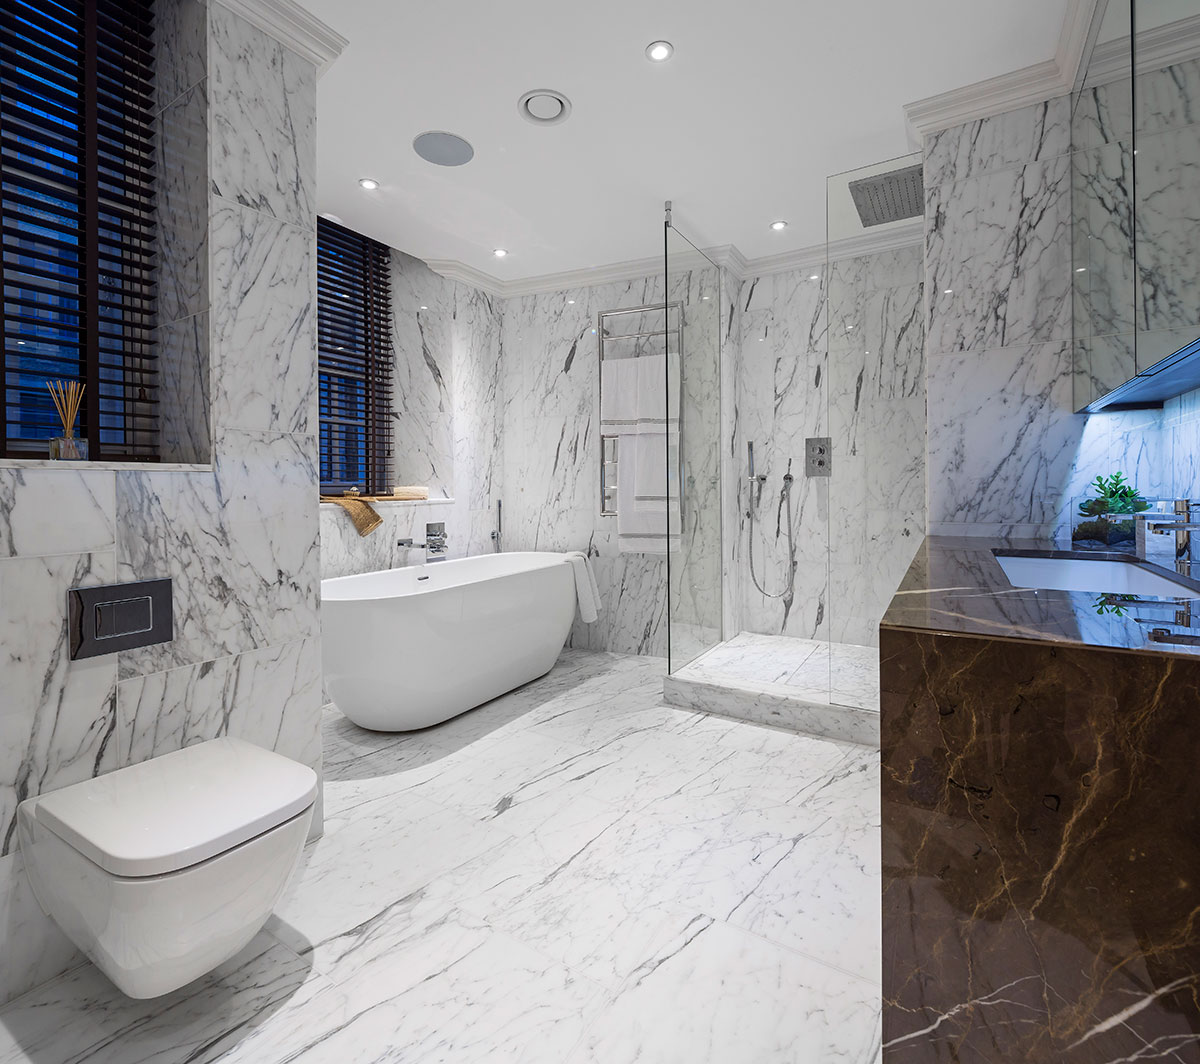 A show apartment's master bathroom.